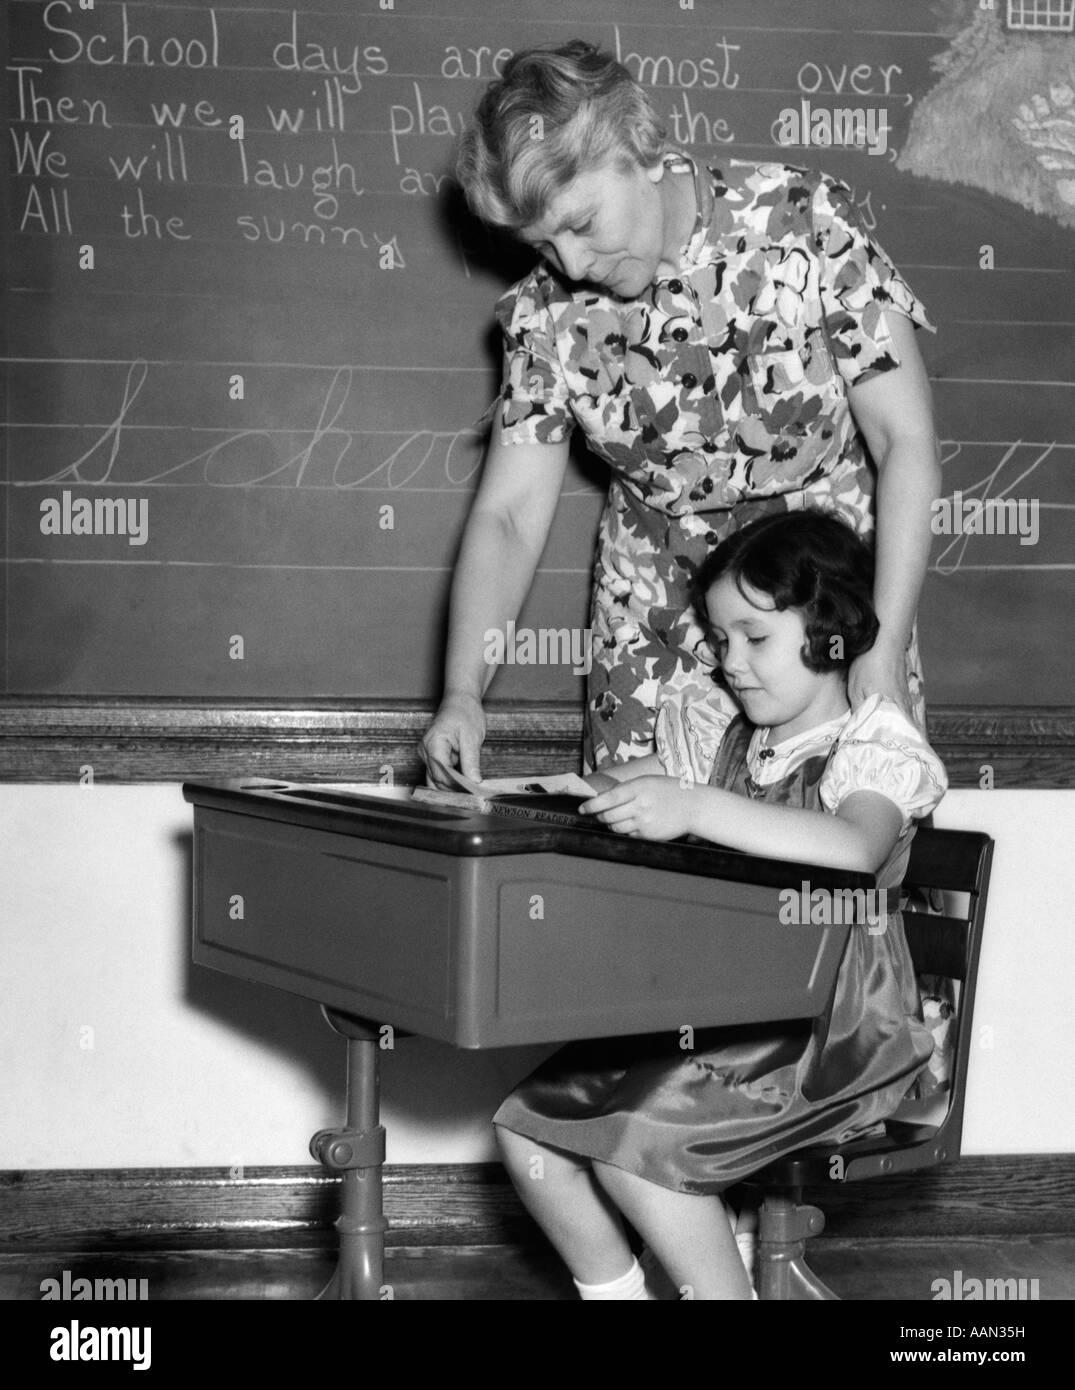 1930s FEMALE TEACHER IN FRONT OF BLACKBOARD HELPING GIRL STUDENT AT DESK READING BOOK - Stock Image